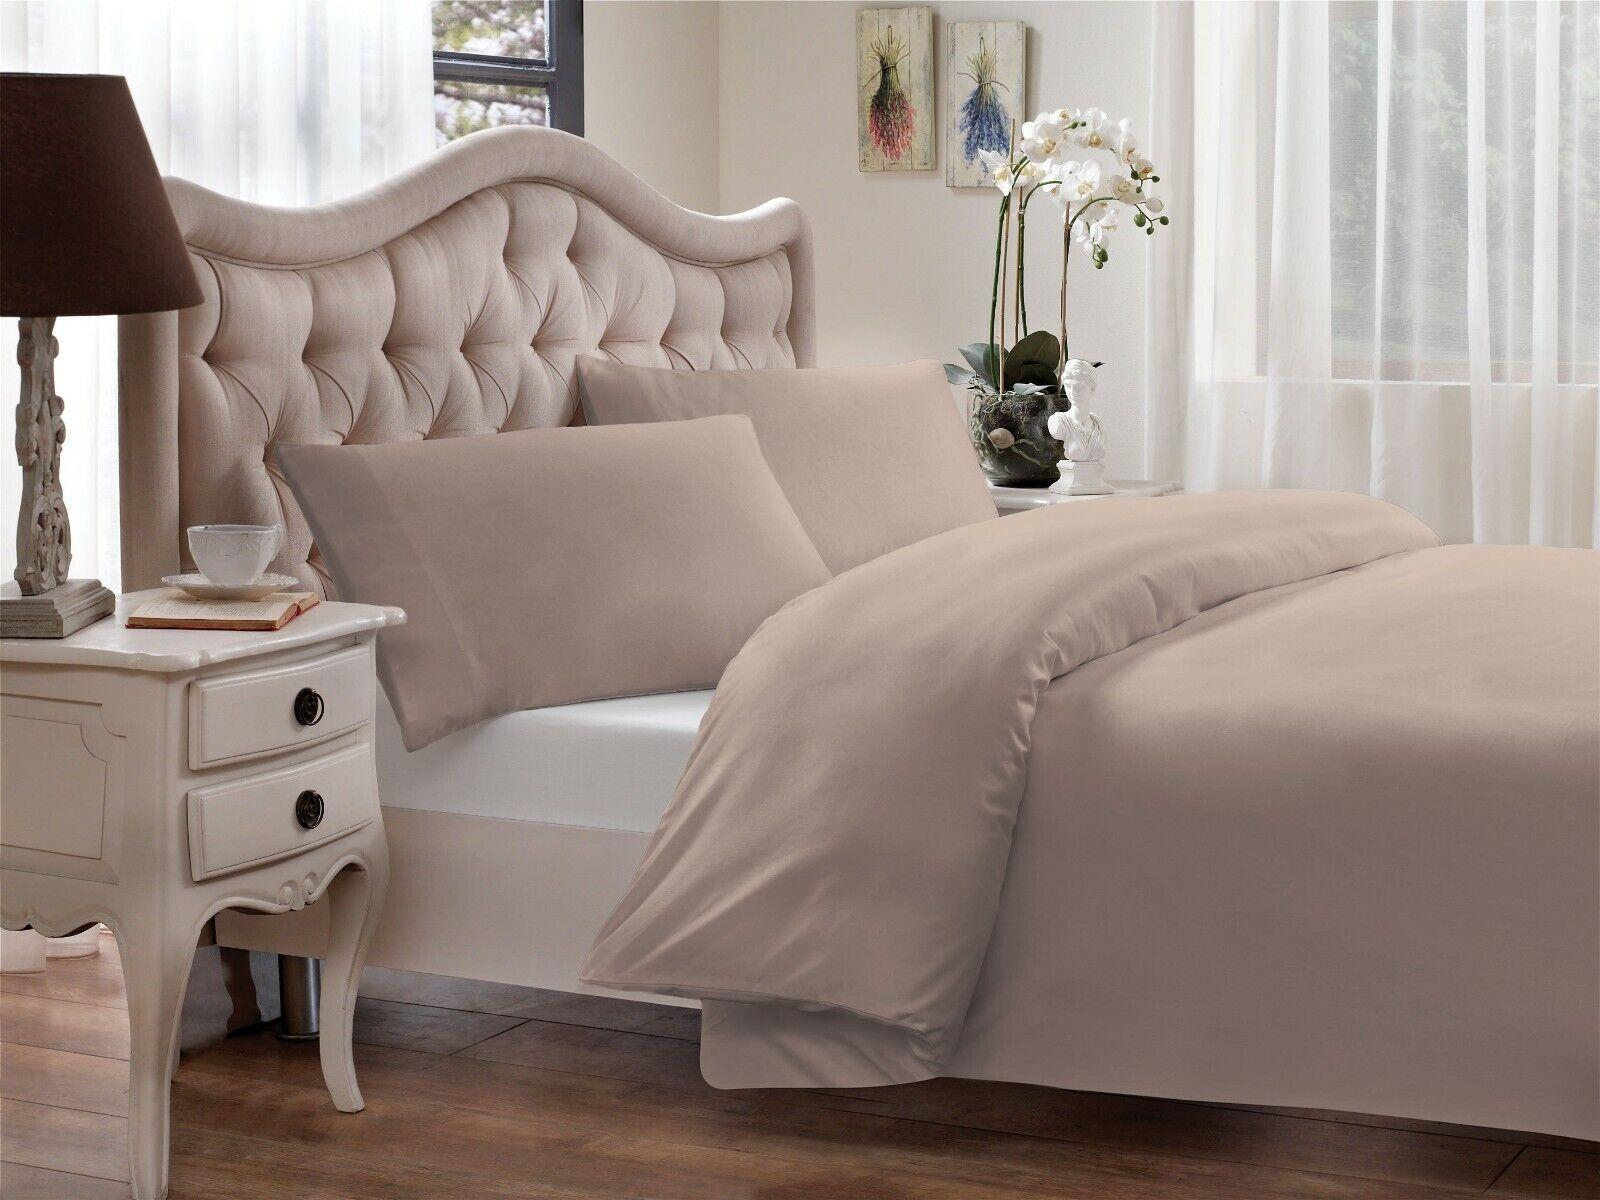 Home 100% Modal Percale 300 Thread Count Duvet Cover Set Bedding